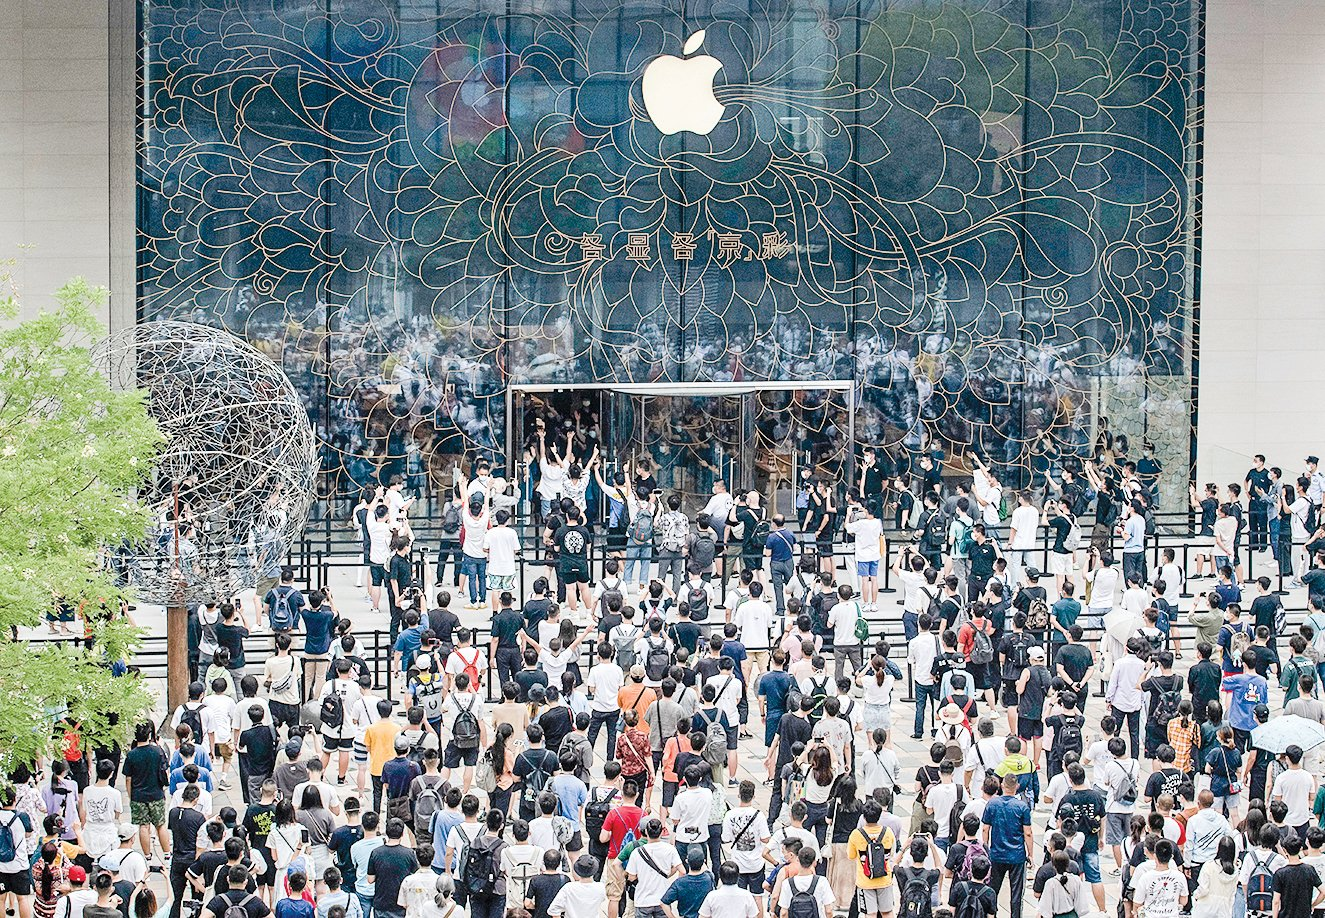 2020年7月17日,北京新開的蘋果手機店門前,大批客戶在門口排隊等待。(Kevin Frayer/Getty Images)